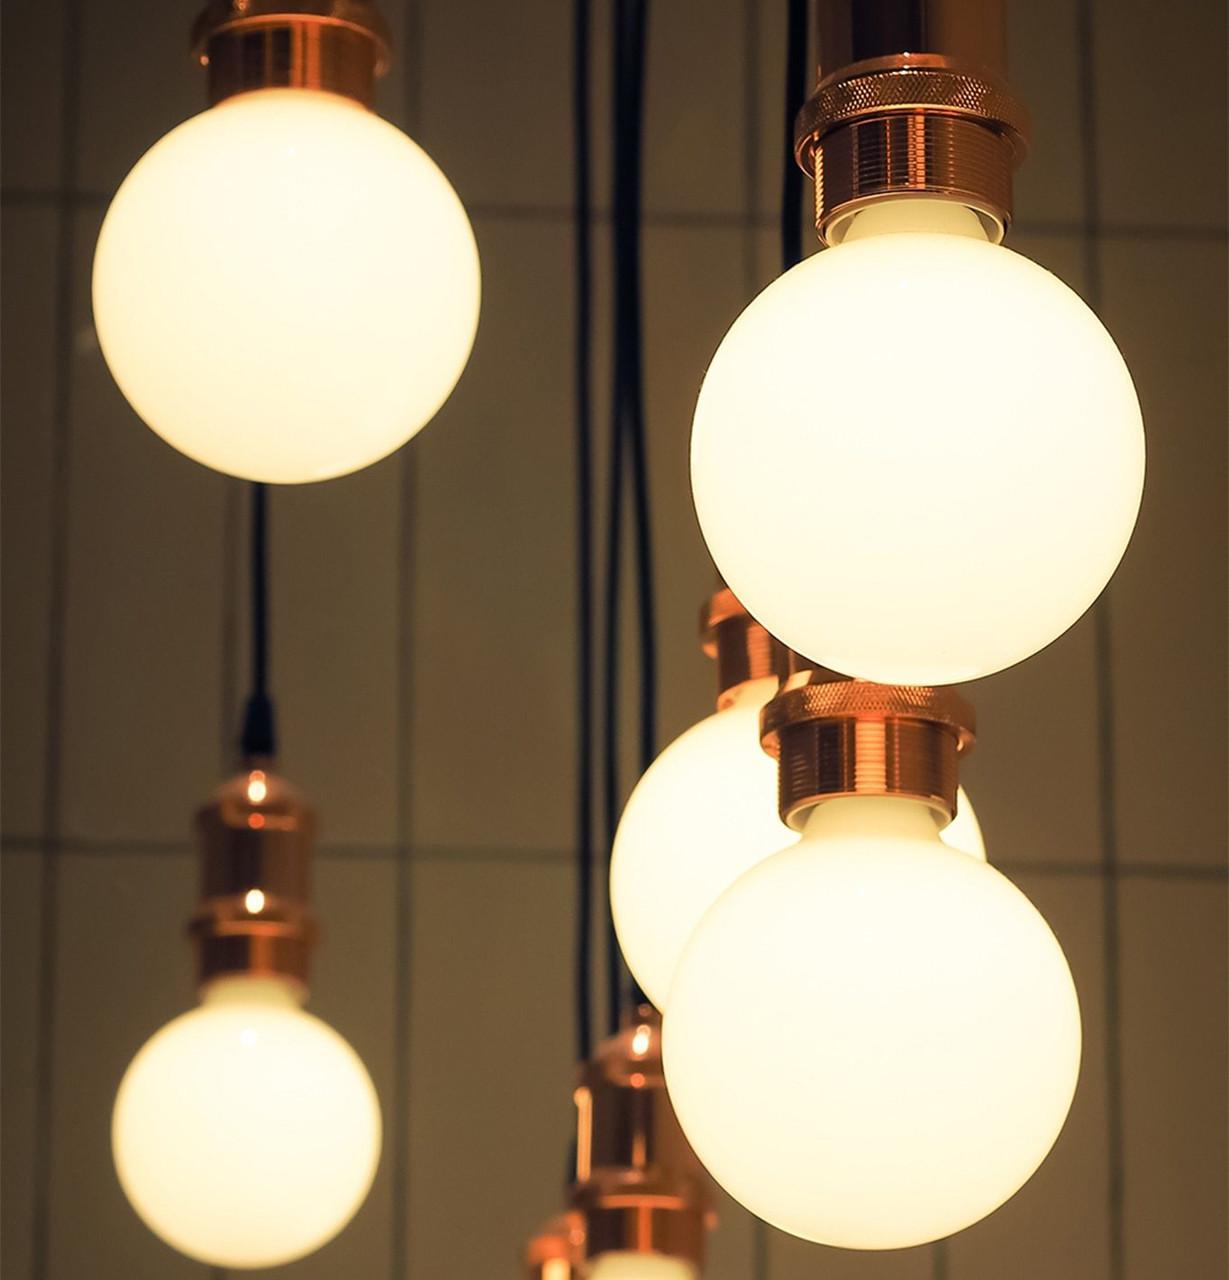 LED Dimmable G95 Pearl Light Bulbs